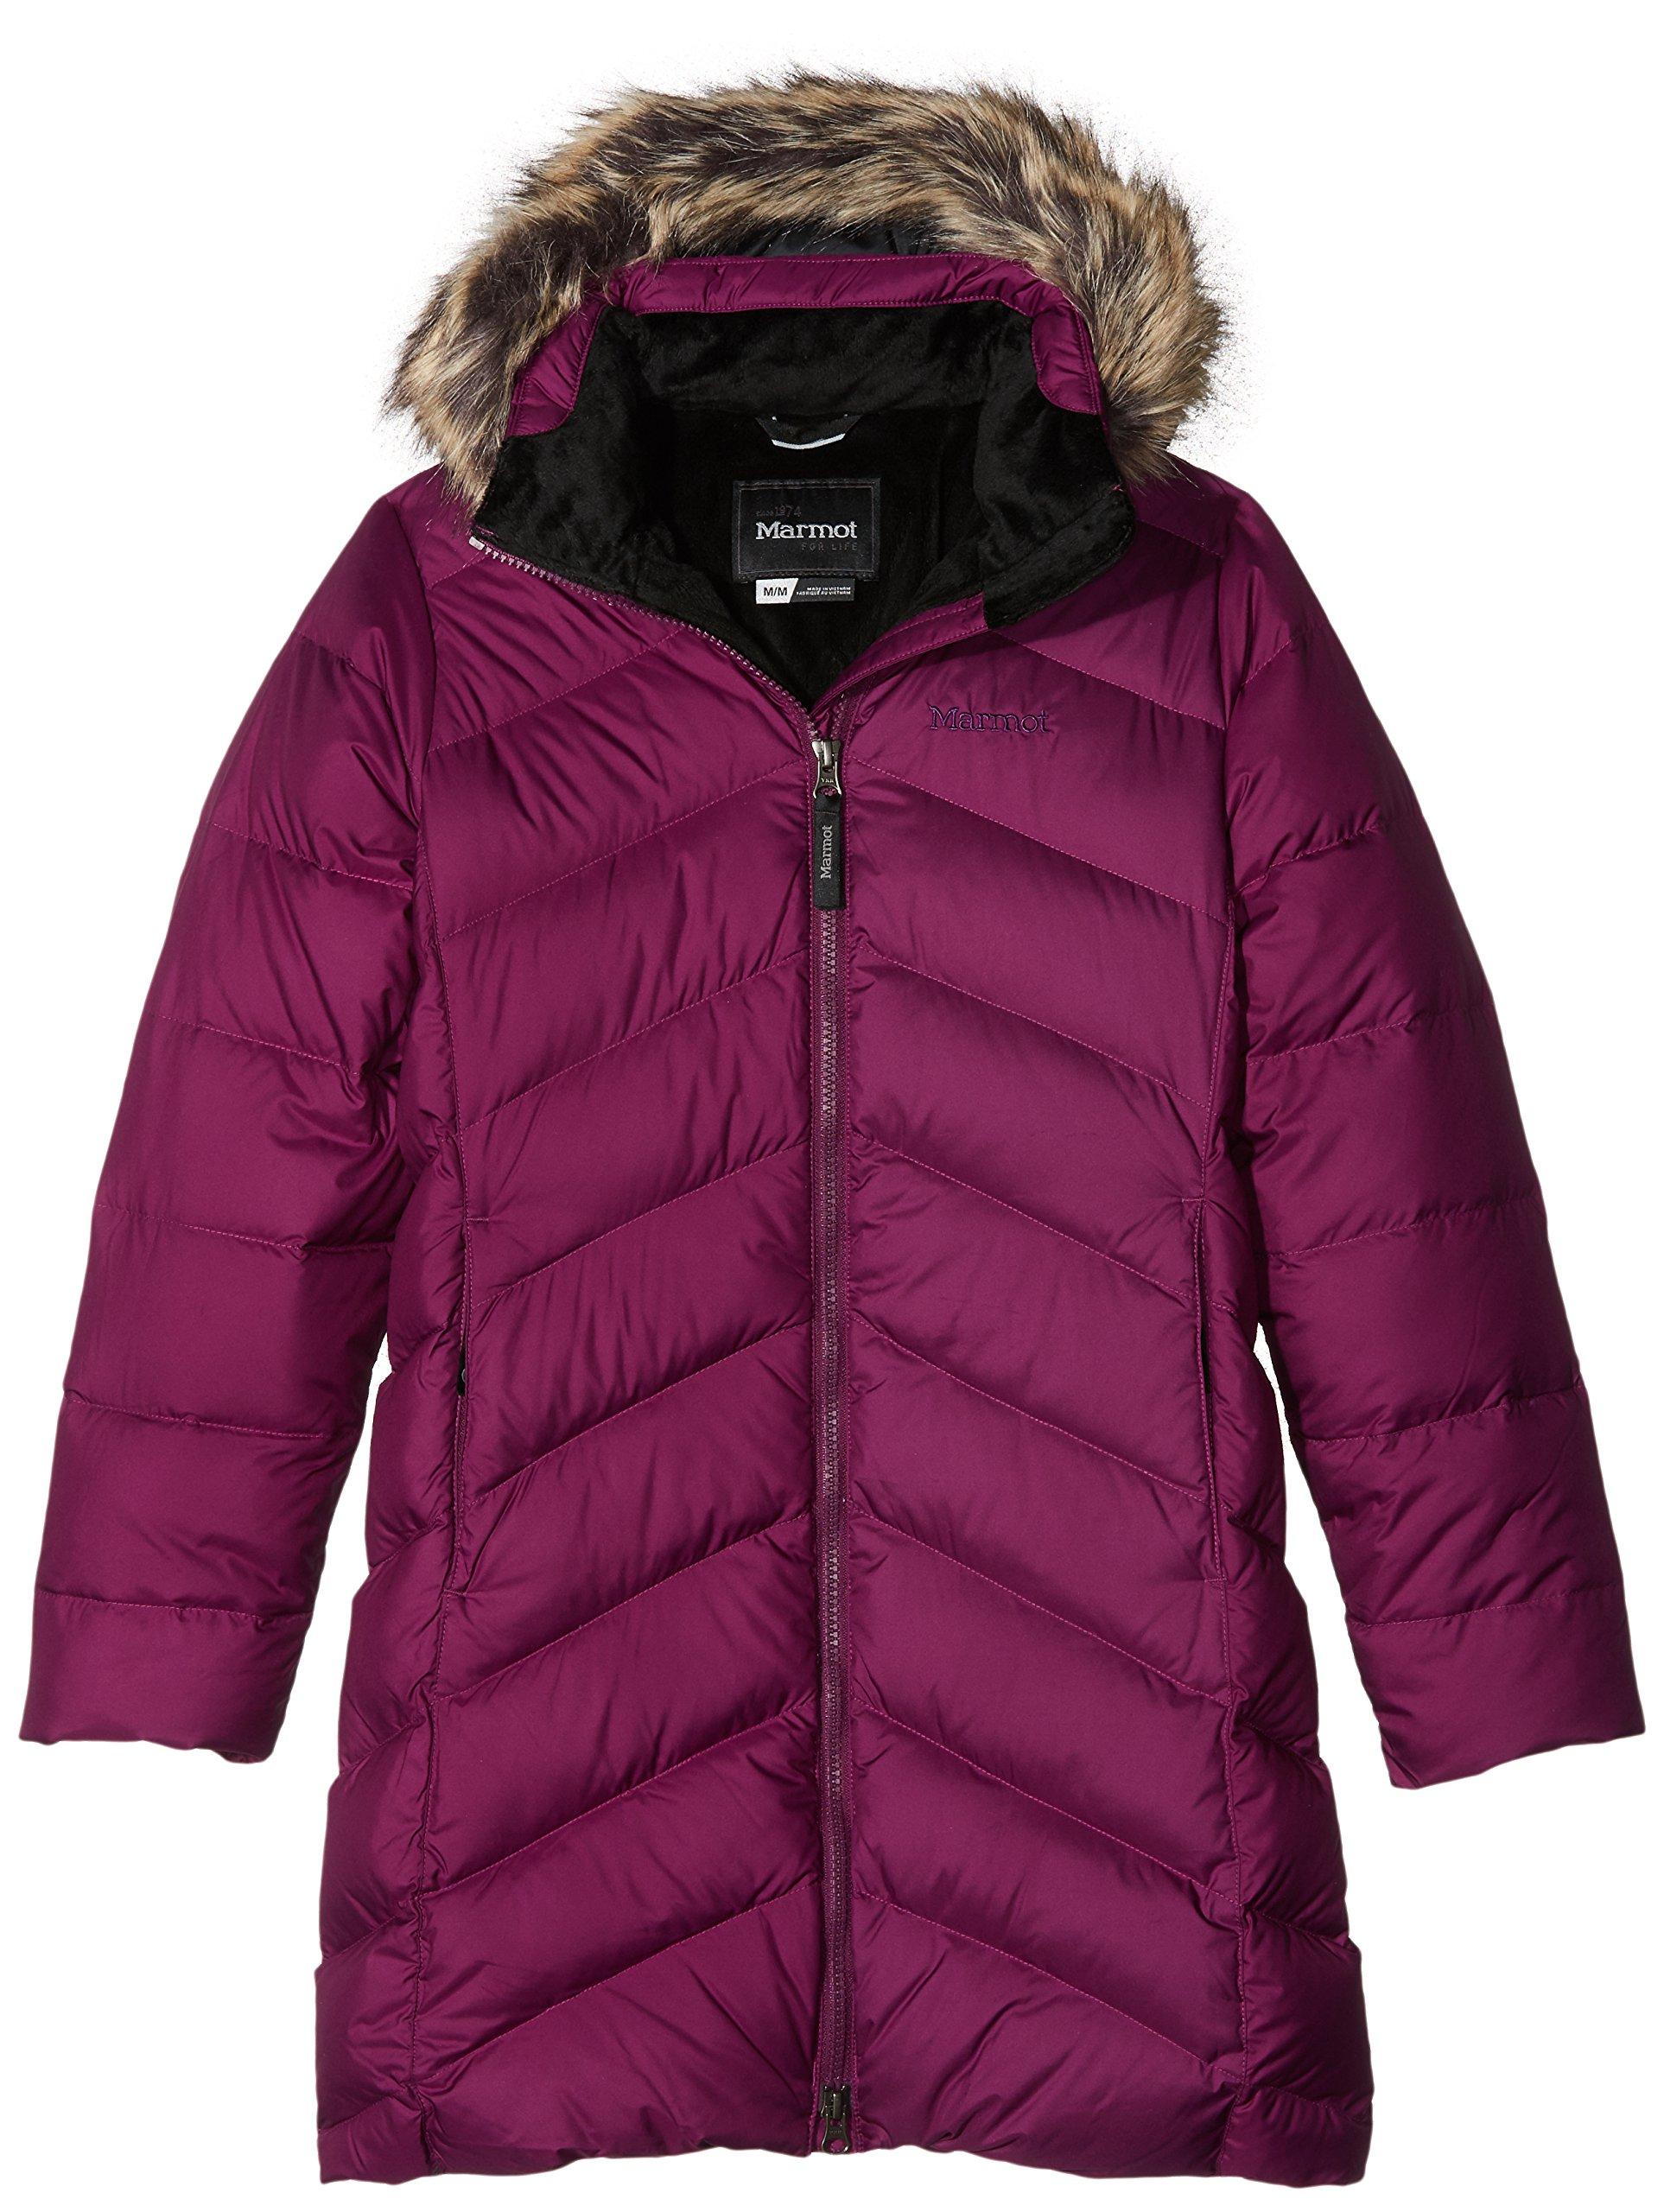 Marmot Kids Girl's Girls' Montreaux Coat (Little Kids/Big Kids) Deep Plum Large